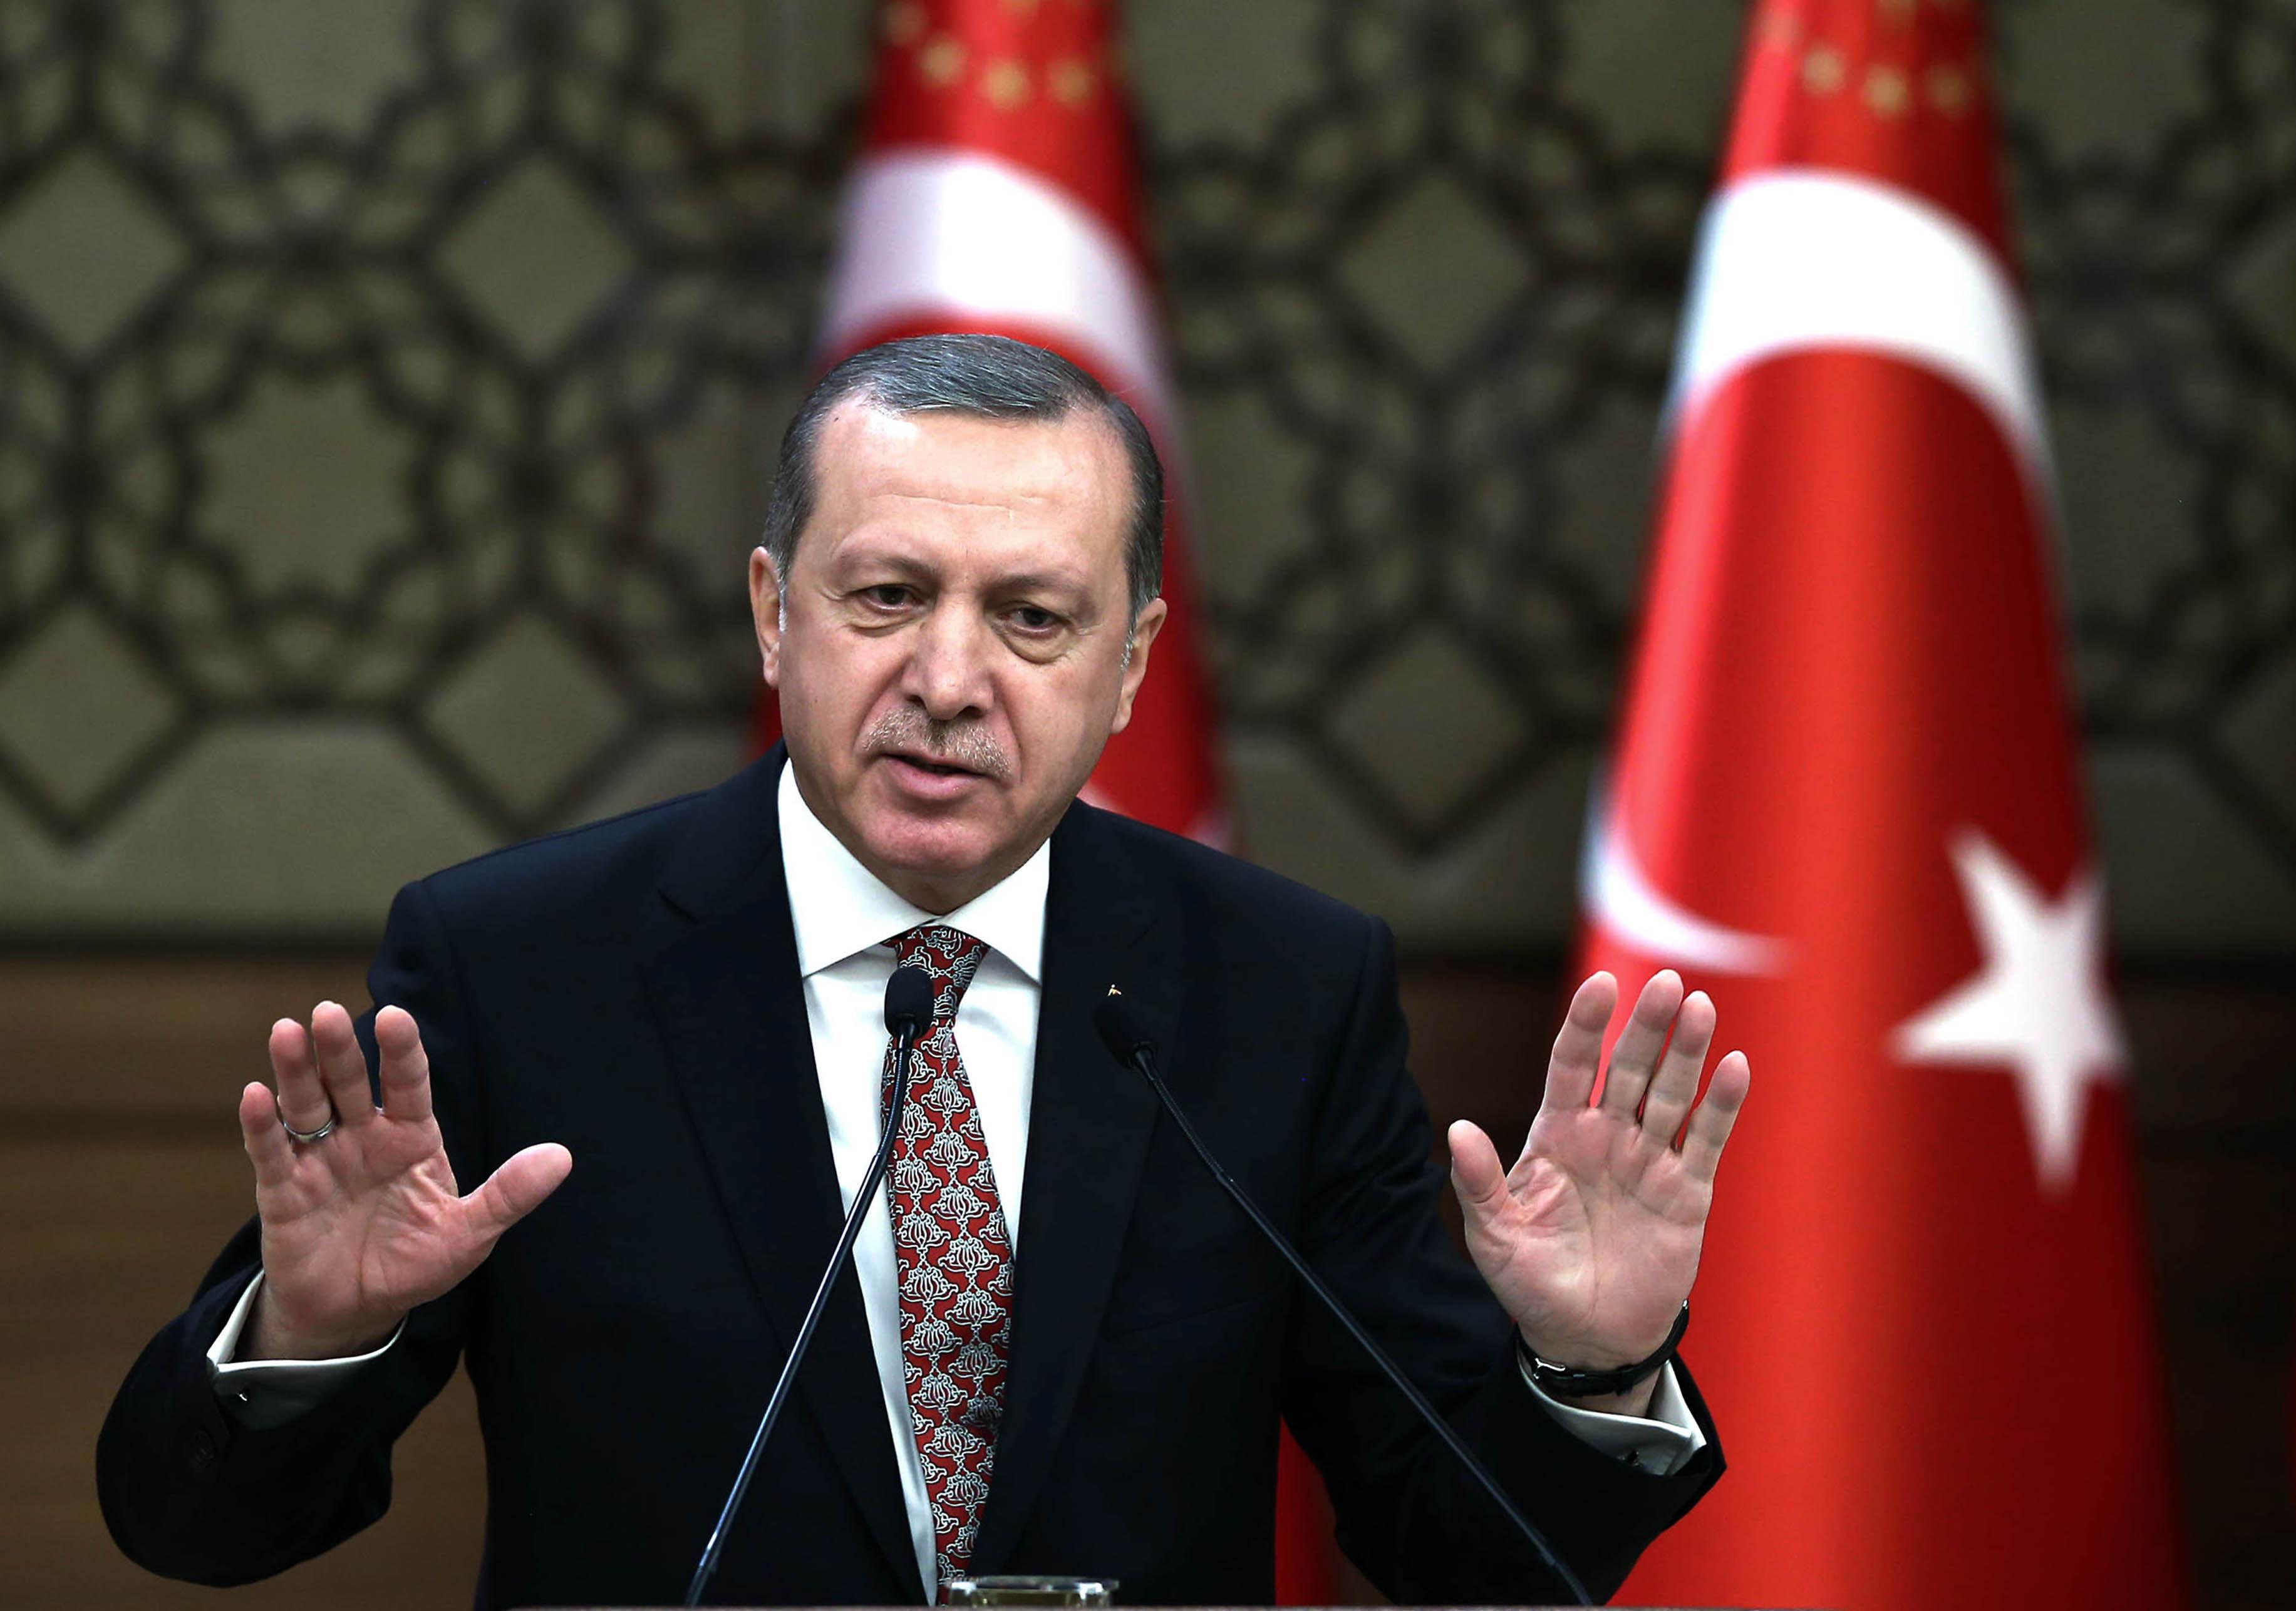 Doi jurnalisti din Turcia risca inchisoare pe viata din cauza unui articol. Dezvaluirile care l-au infuriat pe Erdogan